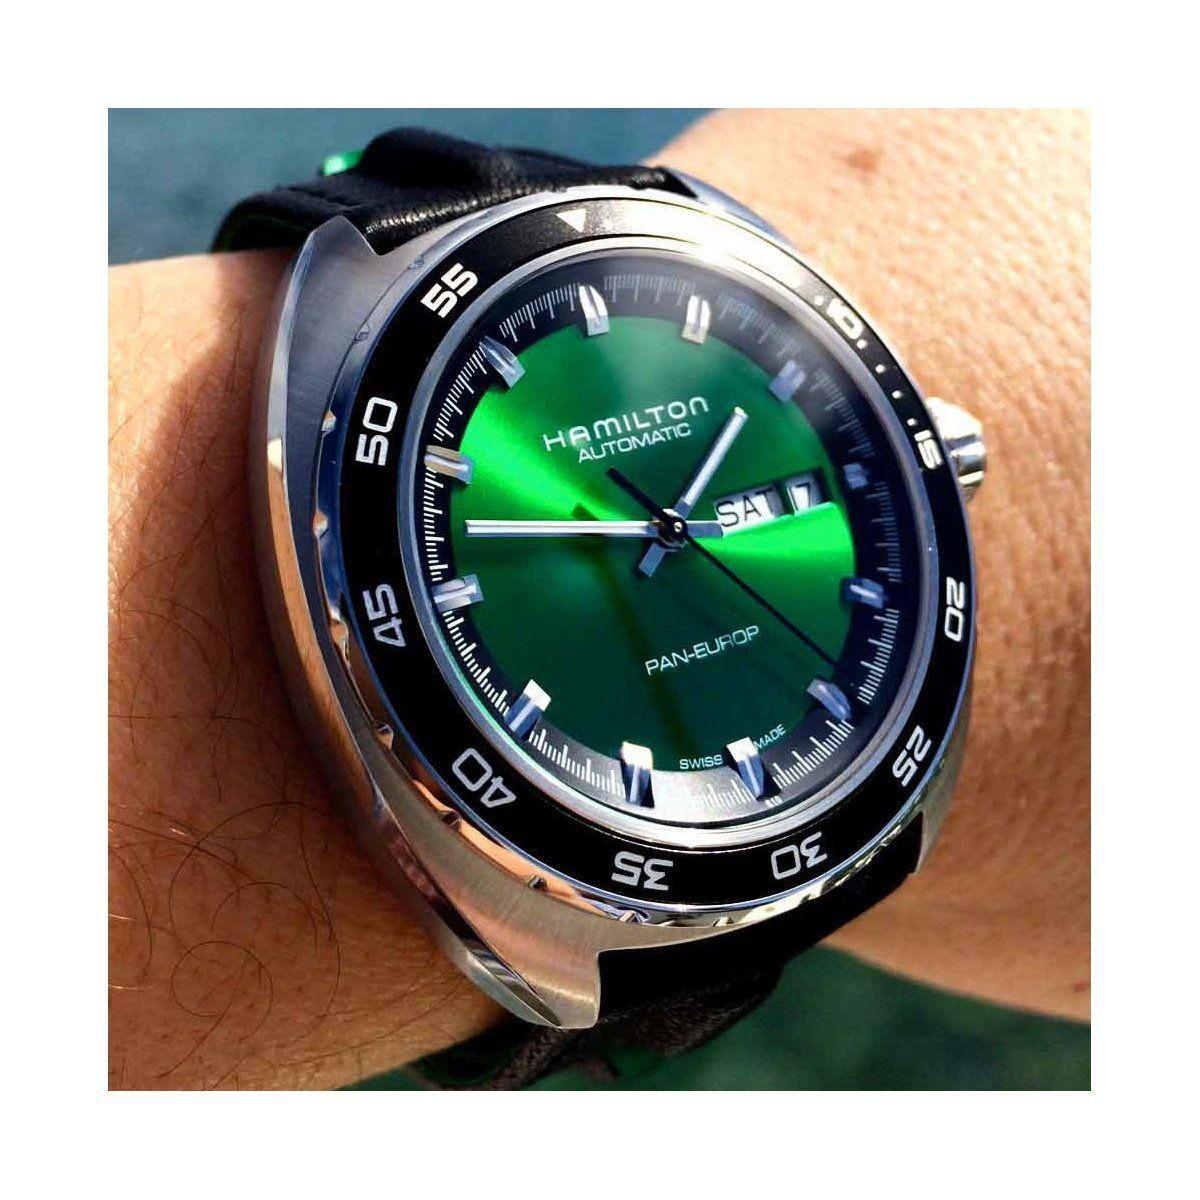 hamilton-american-classic-pan-europ-auto-150-m-42-mm-esf-verde-piel-negra.jpg